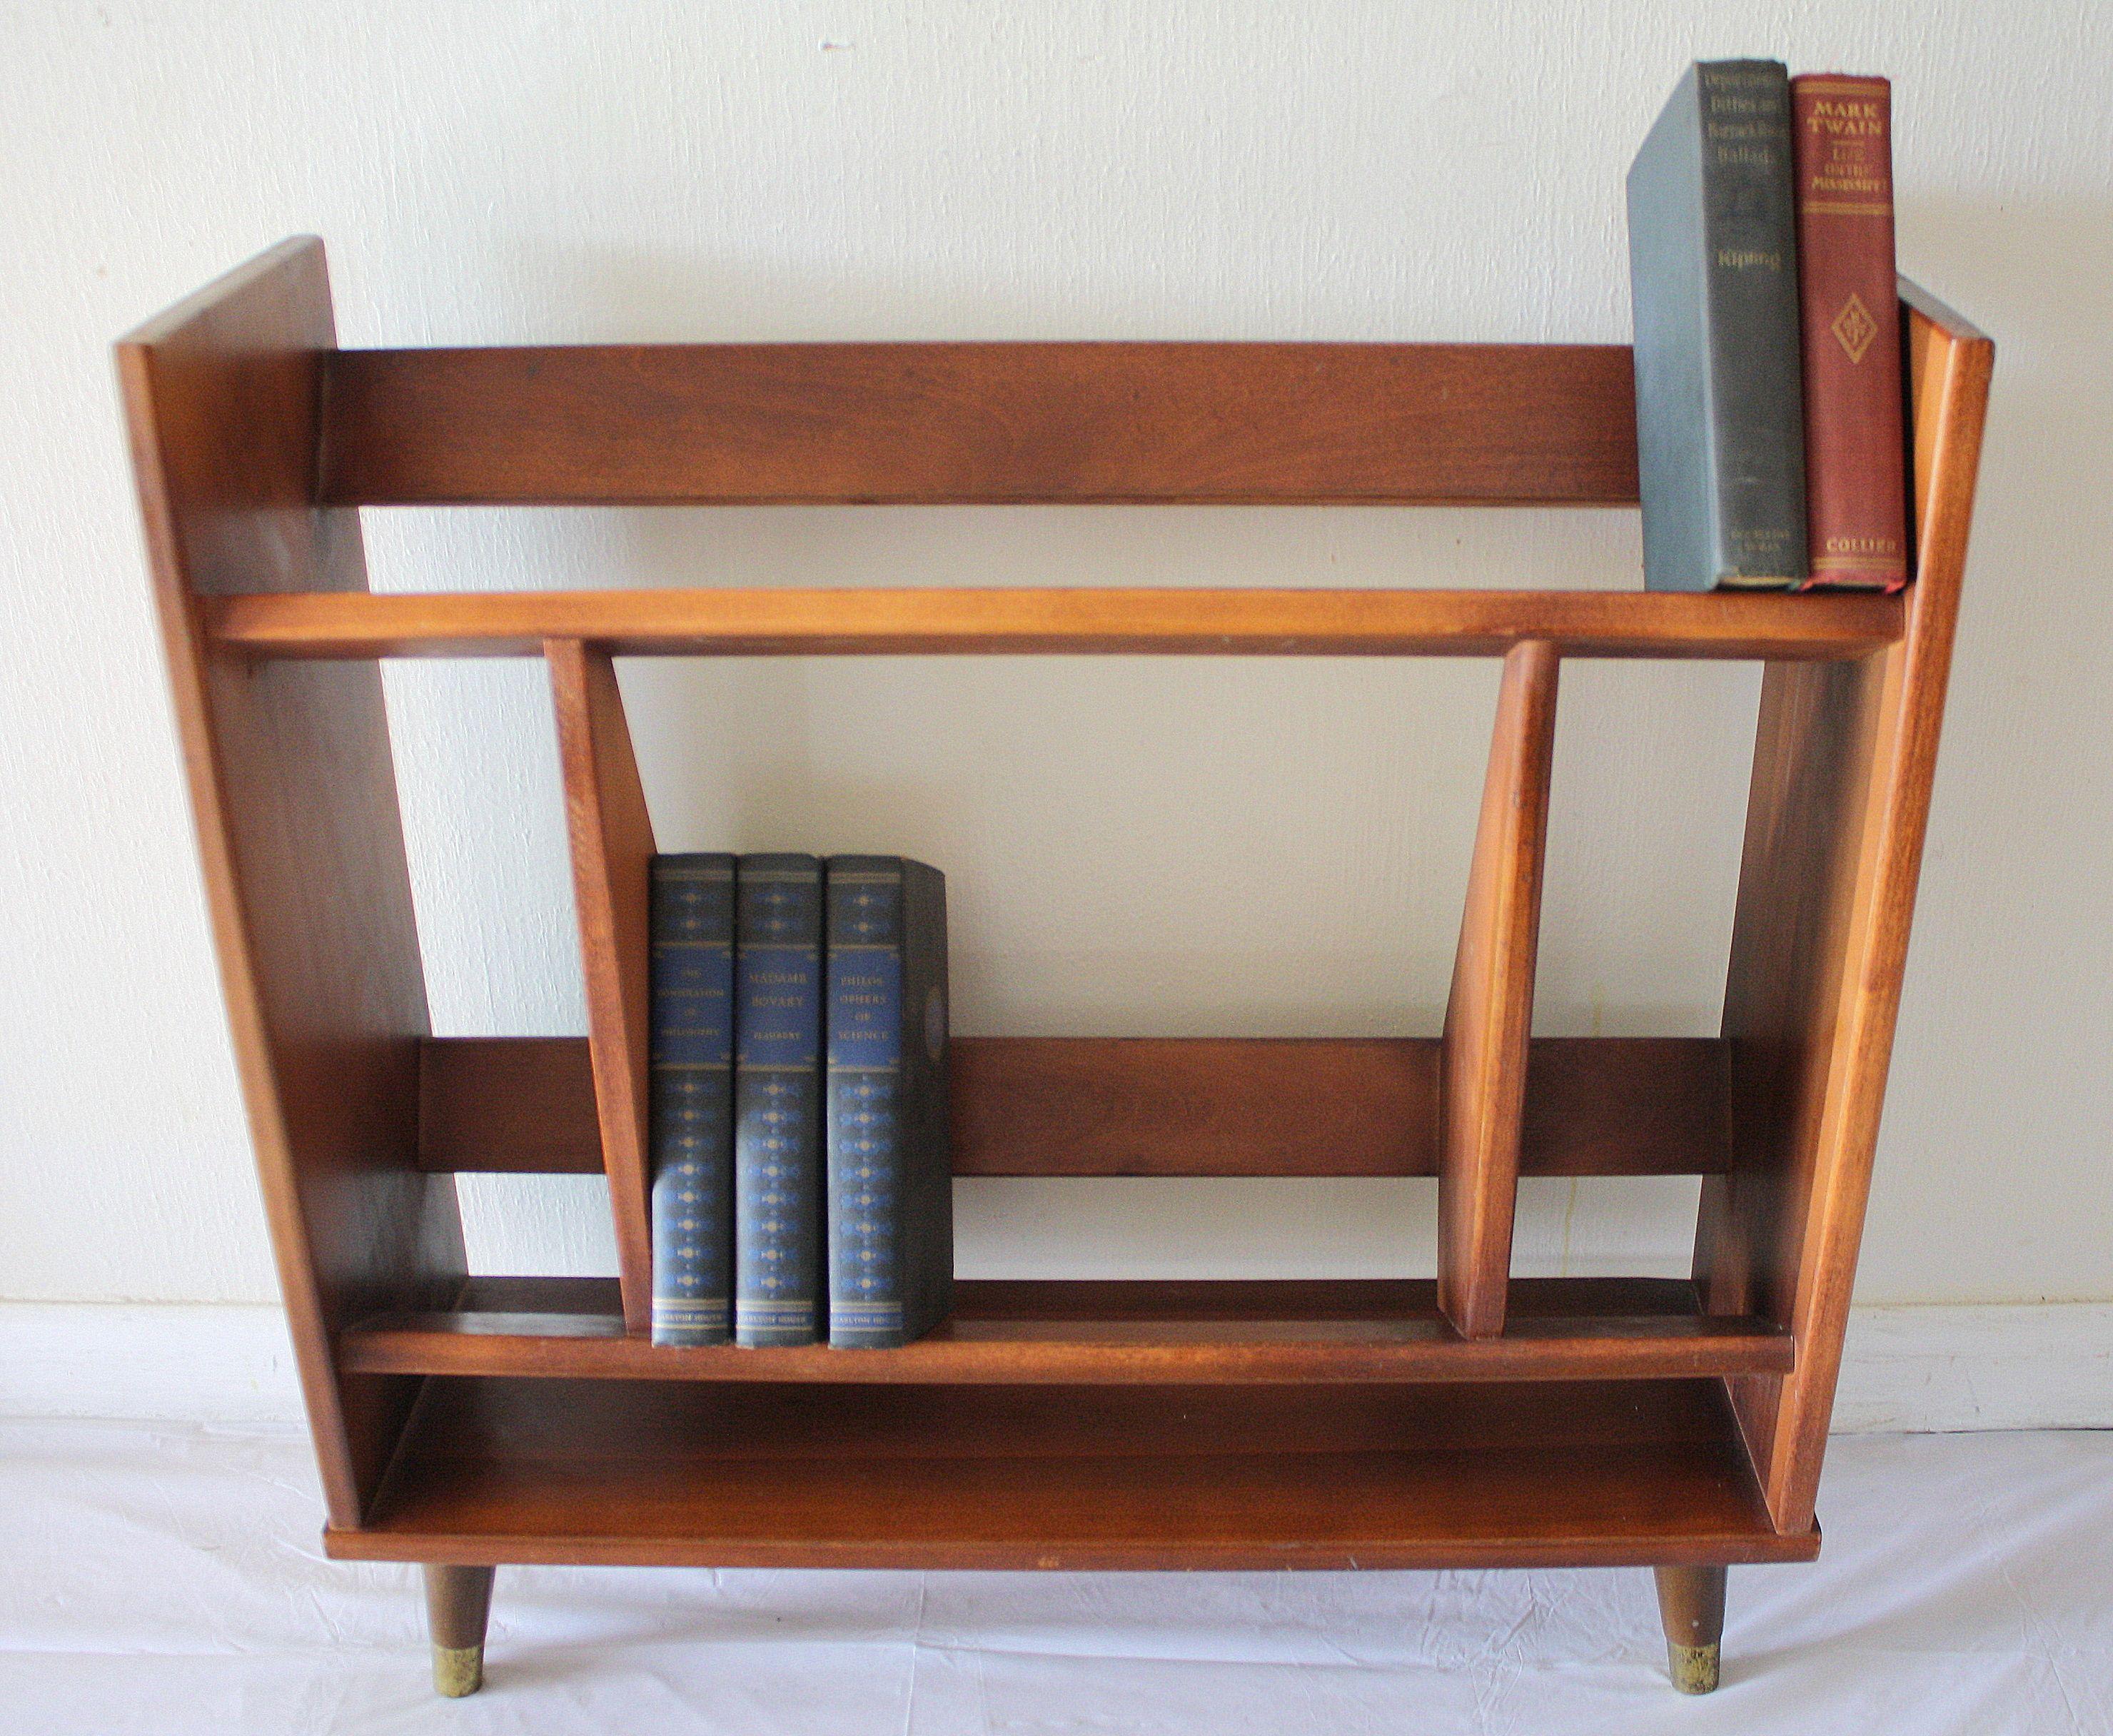 Mcm Mini Danish Bookcase 1 In 2020 Vintage Bookcase Mid Century Modern Shelves Bookshelves Diy